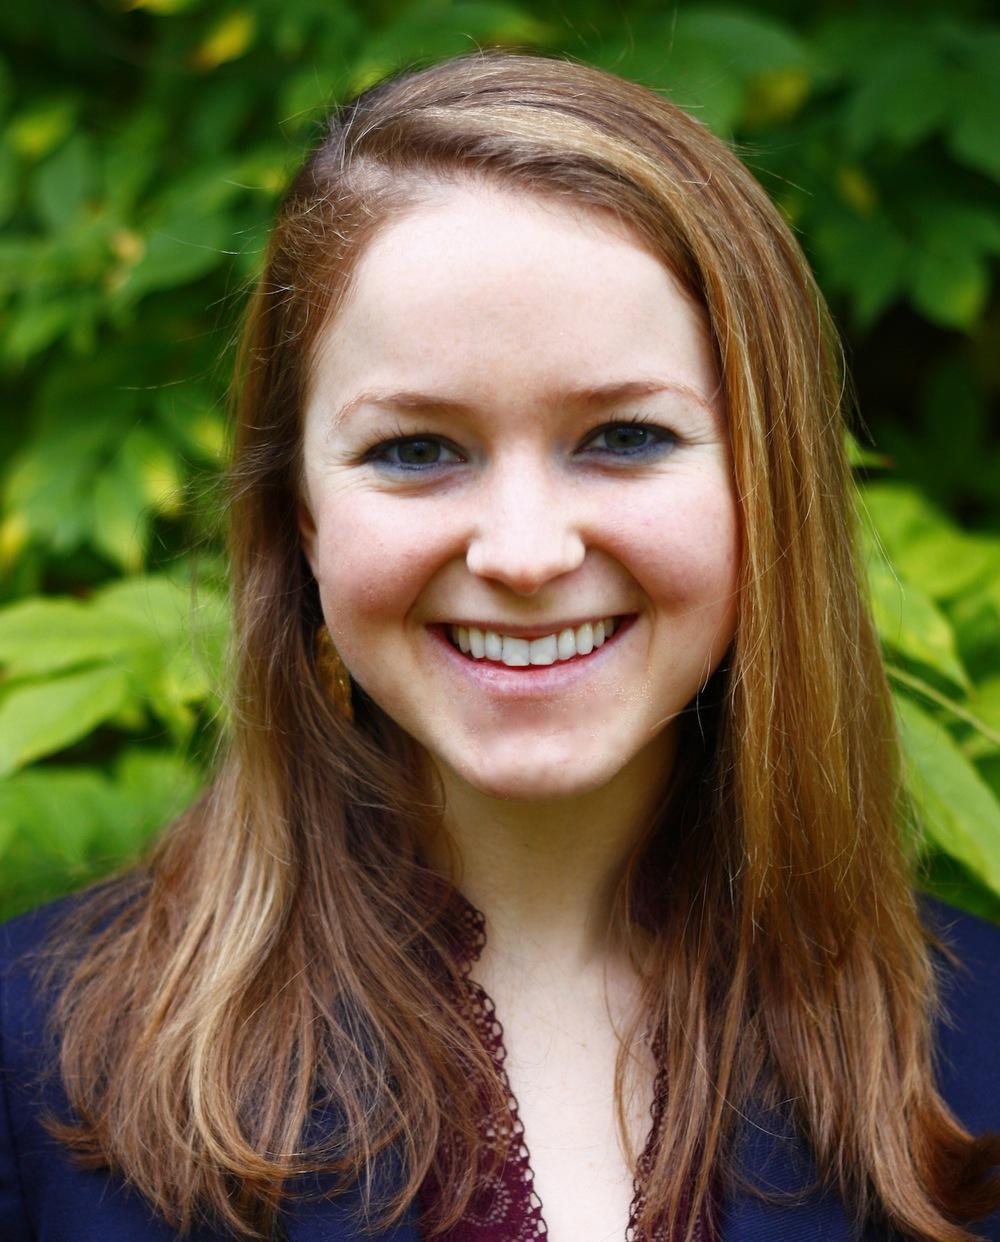 Sarah Smierciak (Illinois & St Antony's 2012)